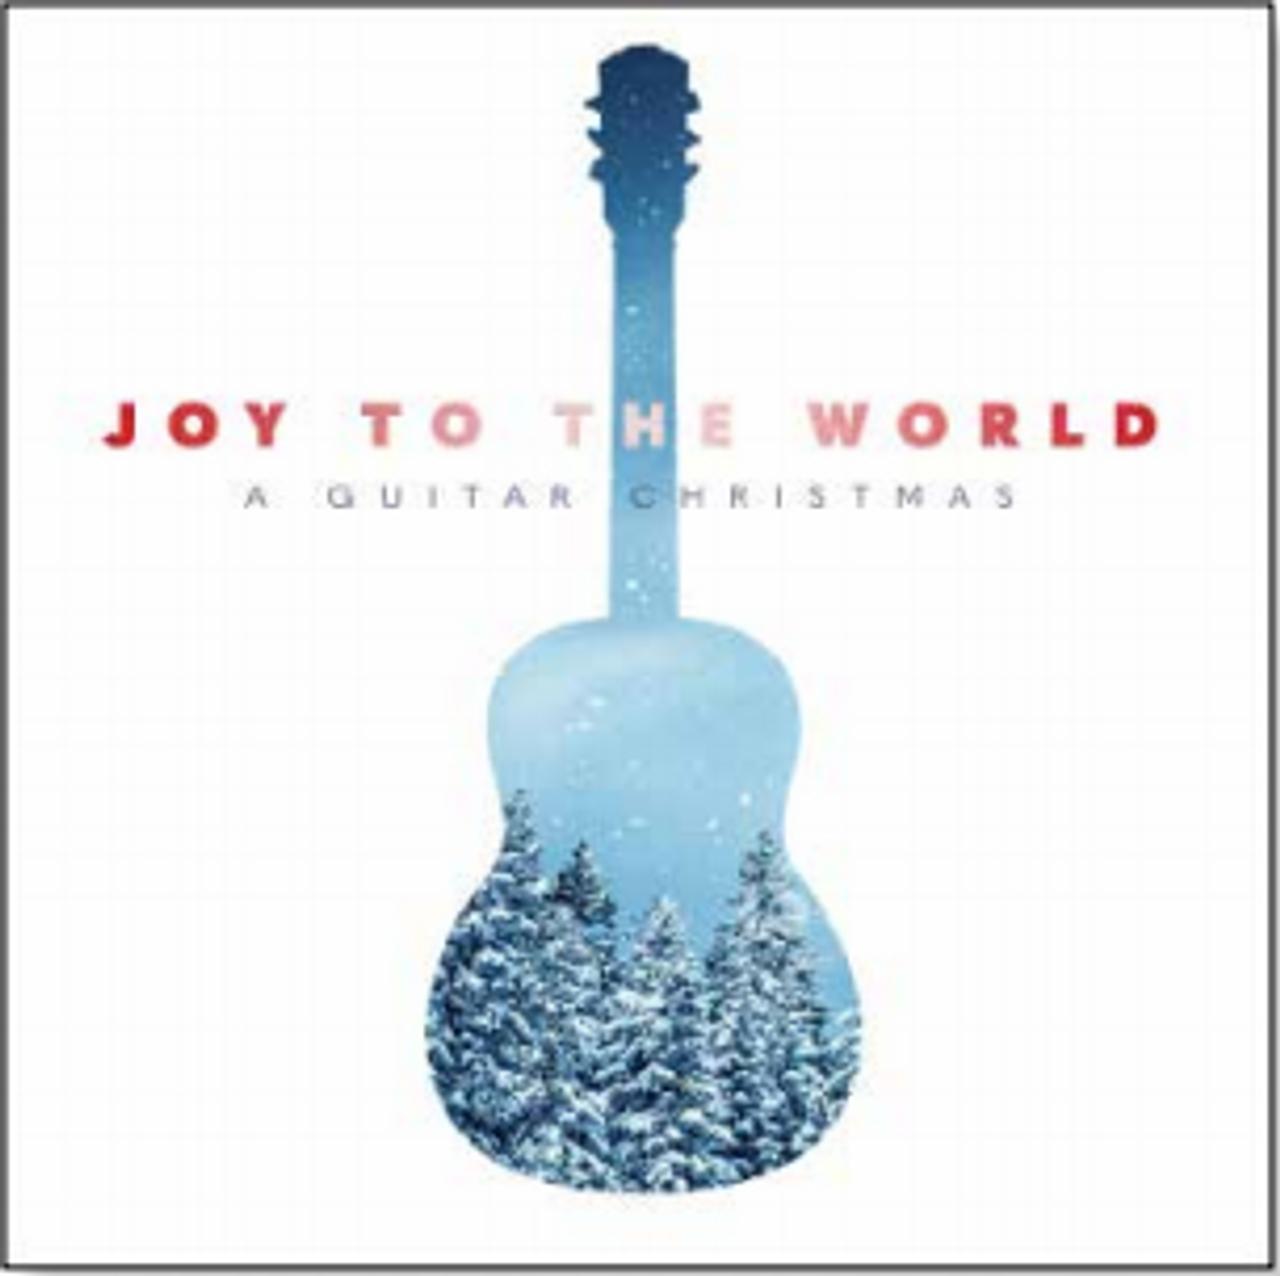 Joy To The World - A Guitar Christmas (Music CD) *